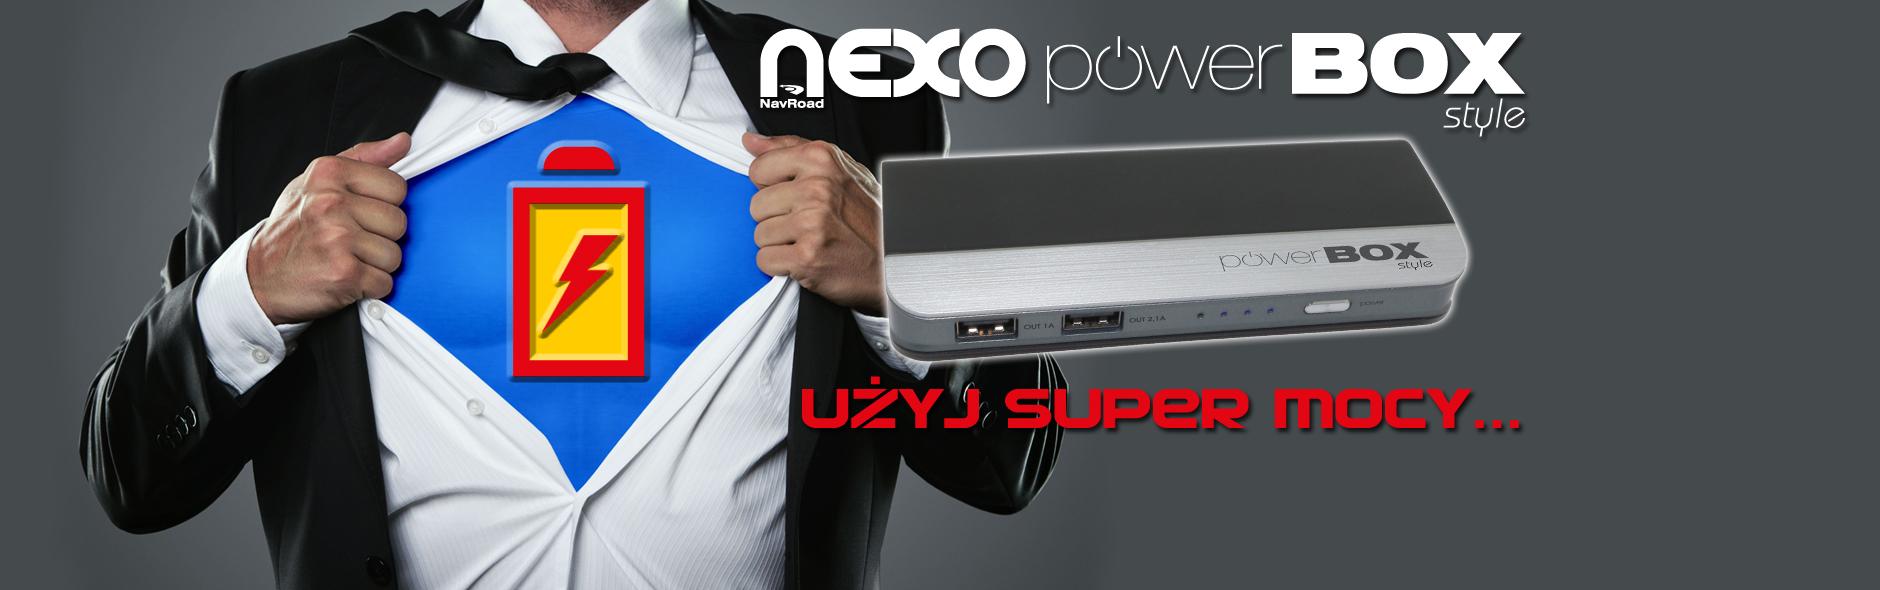 powerBOX style_banner_OK